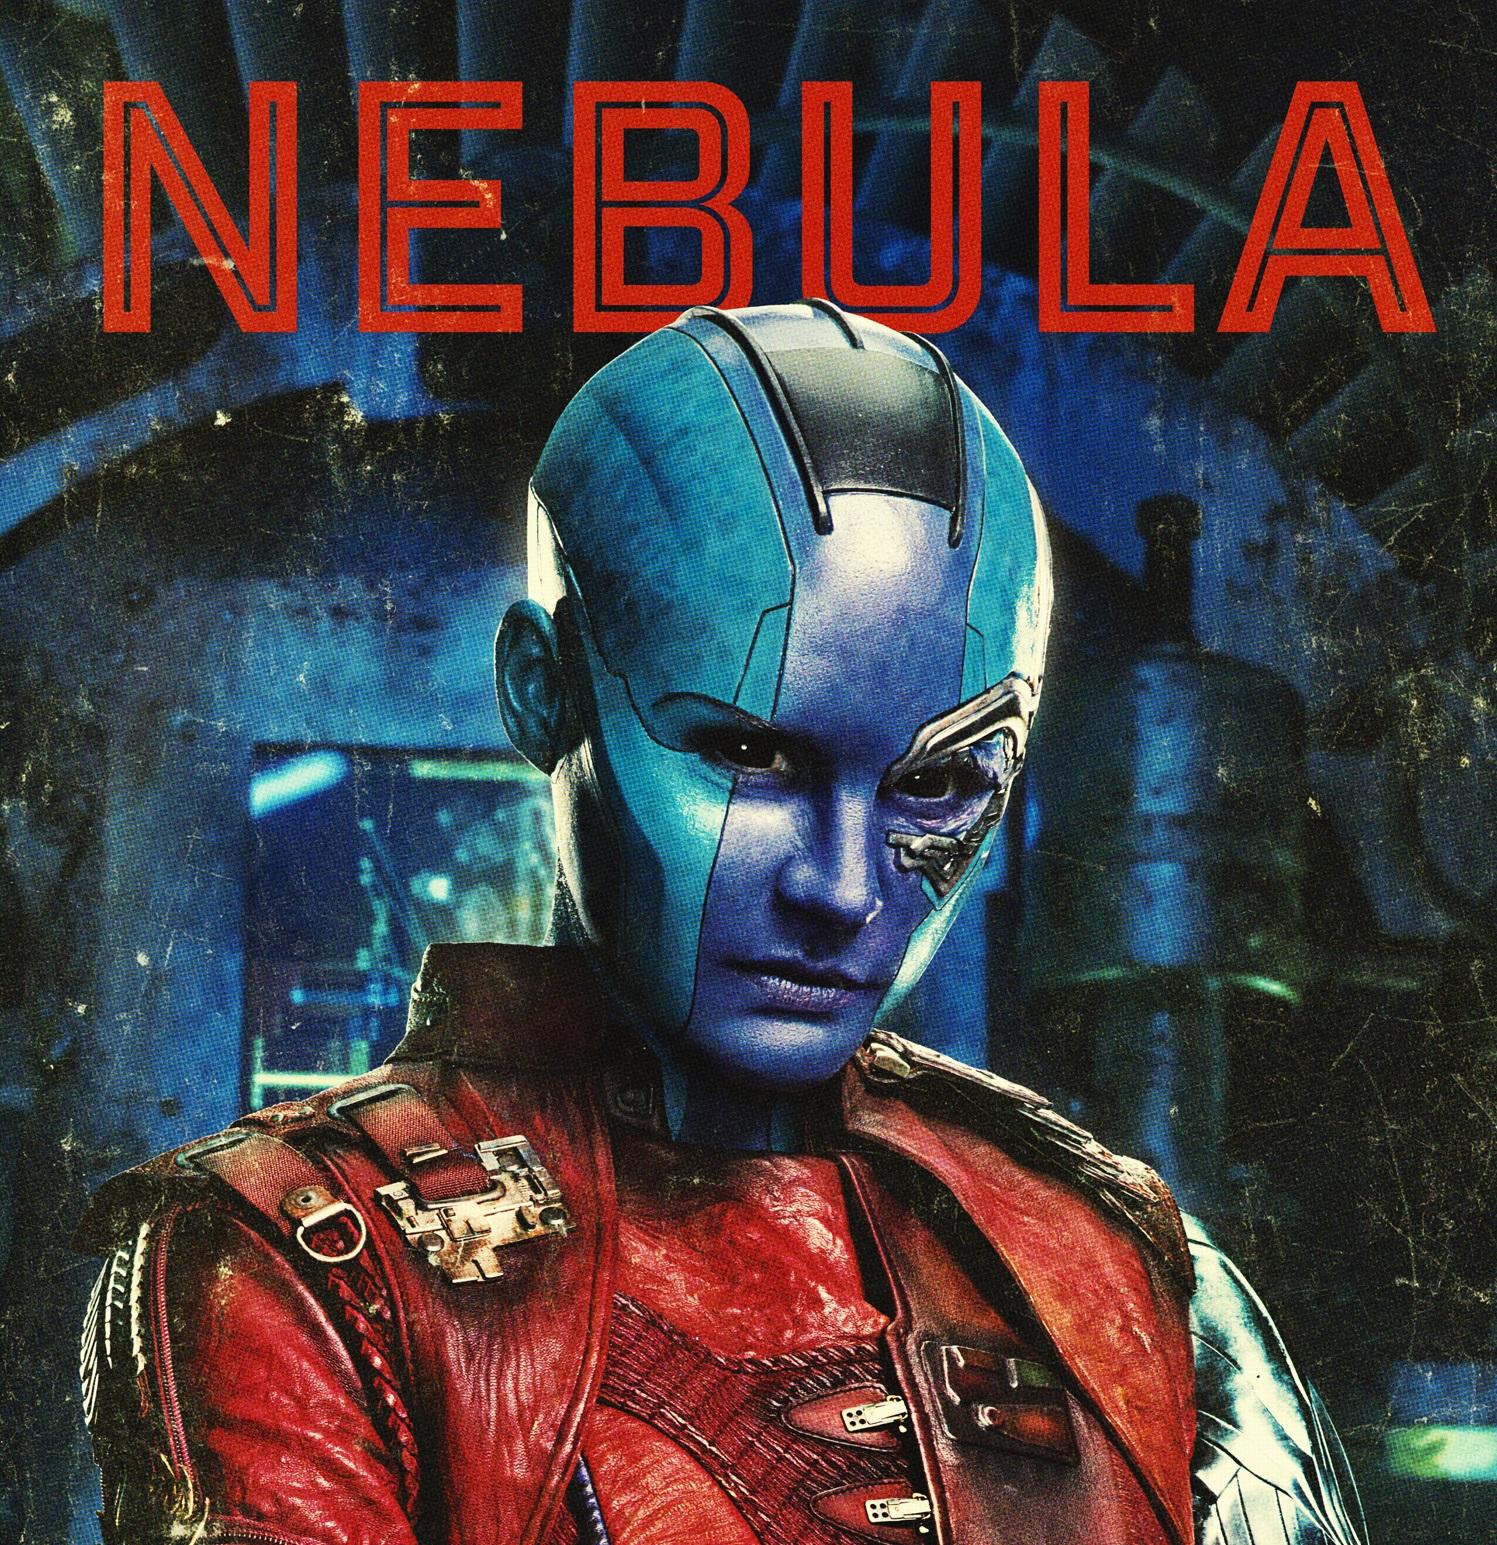 Personajes de Guardianes de la Galaxia (Nebula)